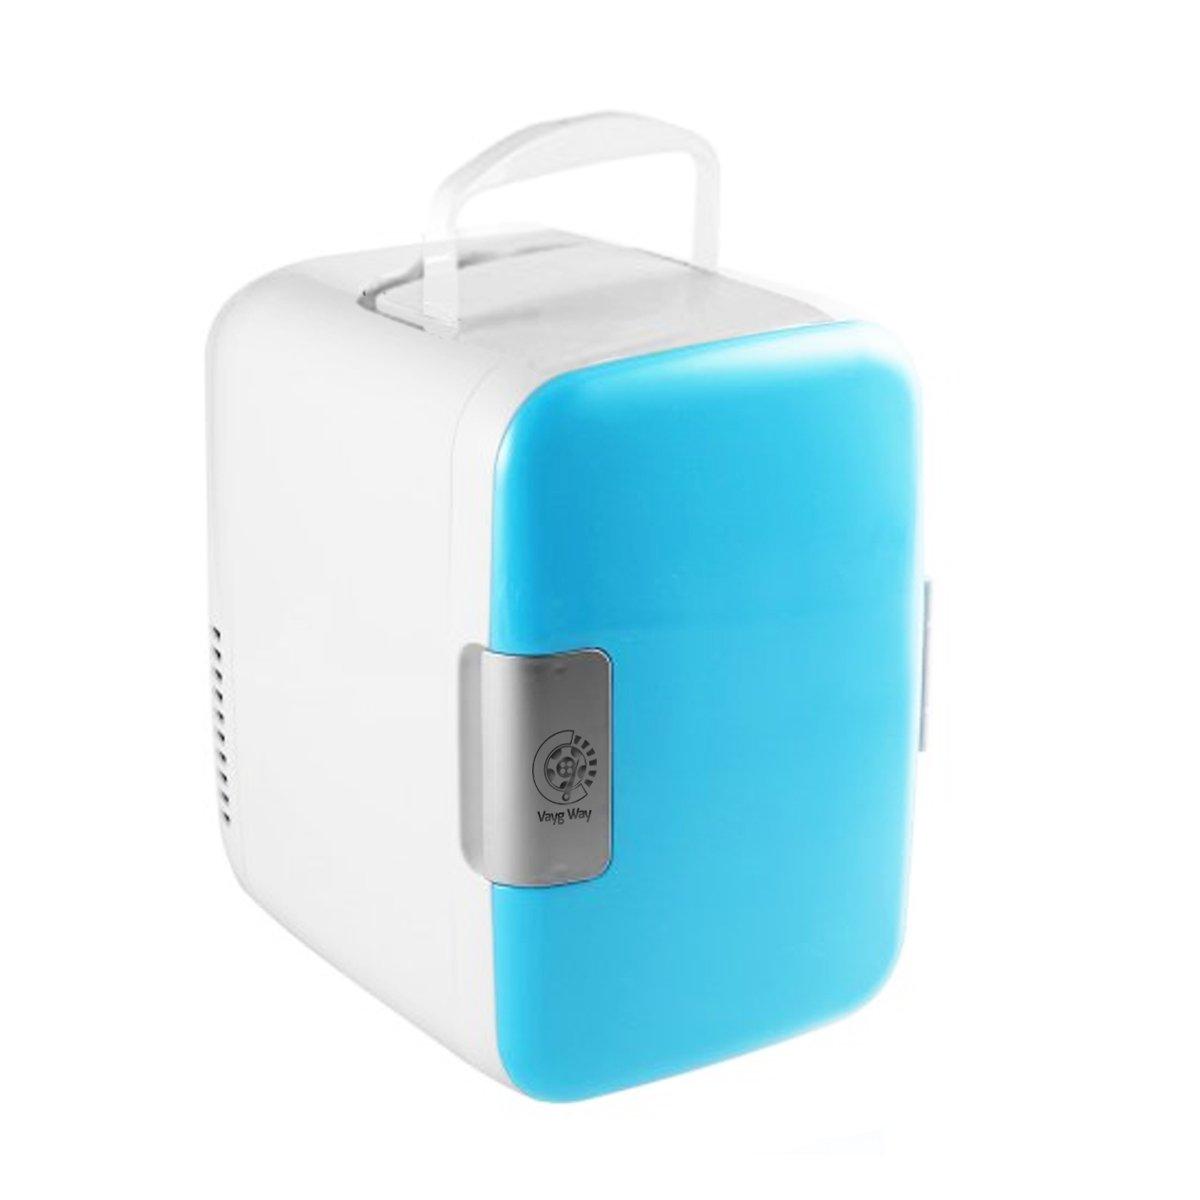 VaygWay Mini Fridge Portable Cooler-Electric Cooler/Warmer AC/DC Thermoelectric System- Universal Refrigerator Car Travel Home-Work Desk Baby Bottle Medicine